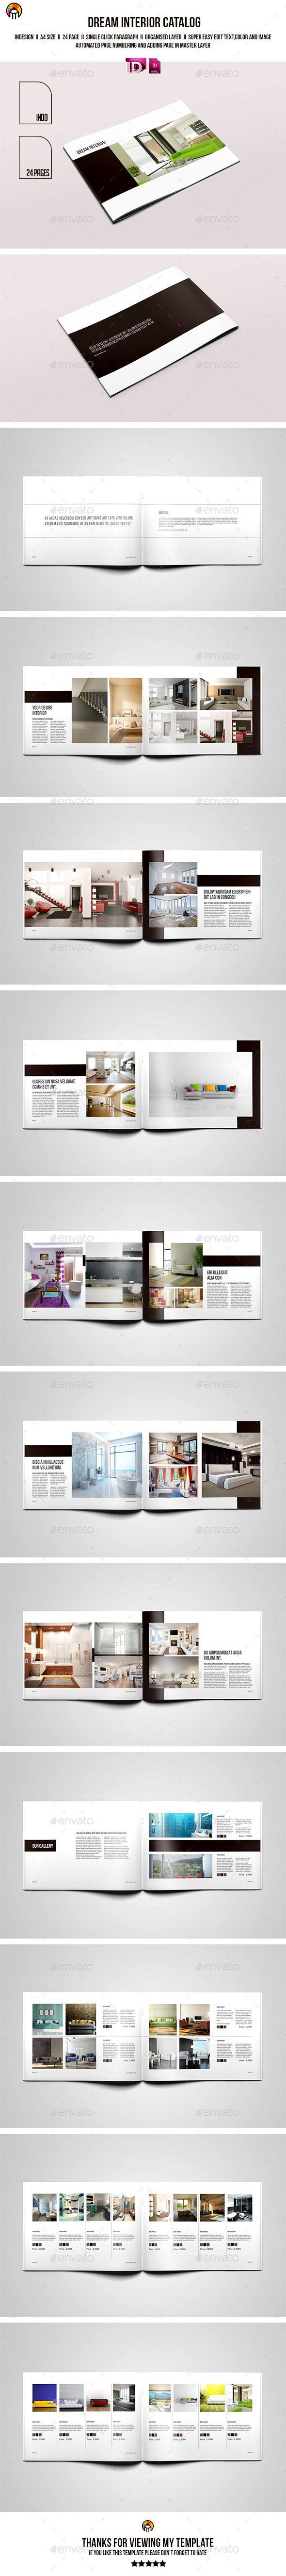 Dream Interior Catalog Brochure Template #design #catalogtemplate Download: http://graphicriver.net/item/dream-interior-catalog/11723018?ref=ksioks